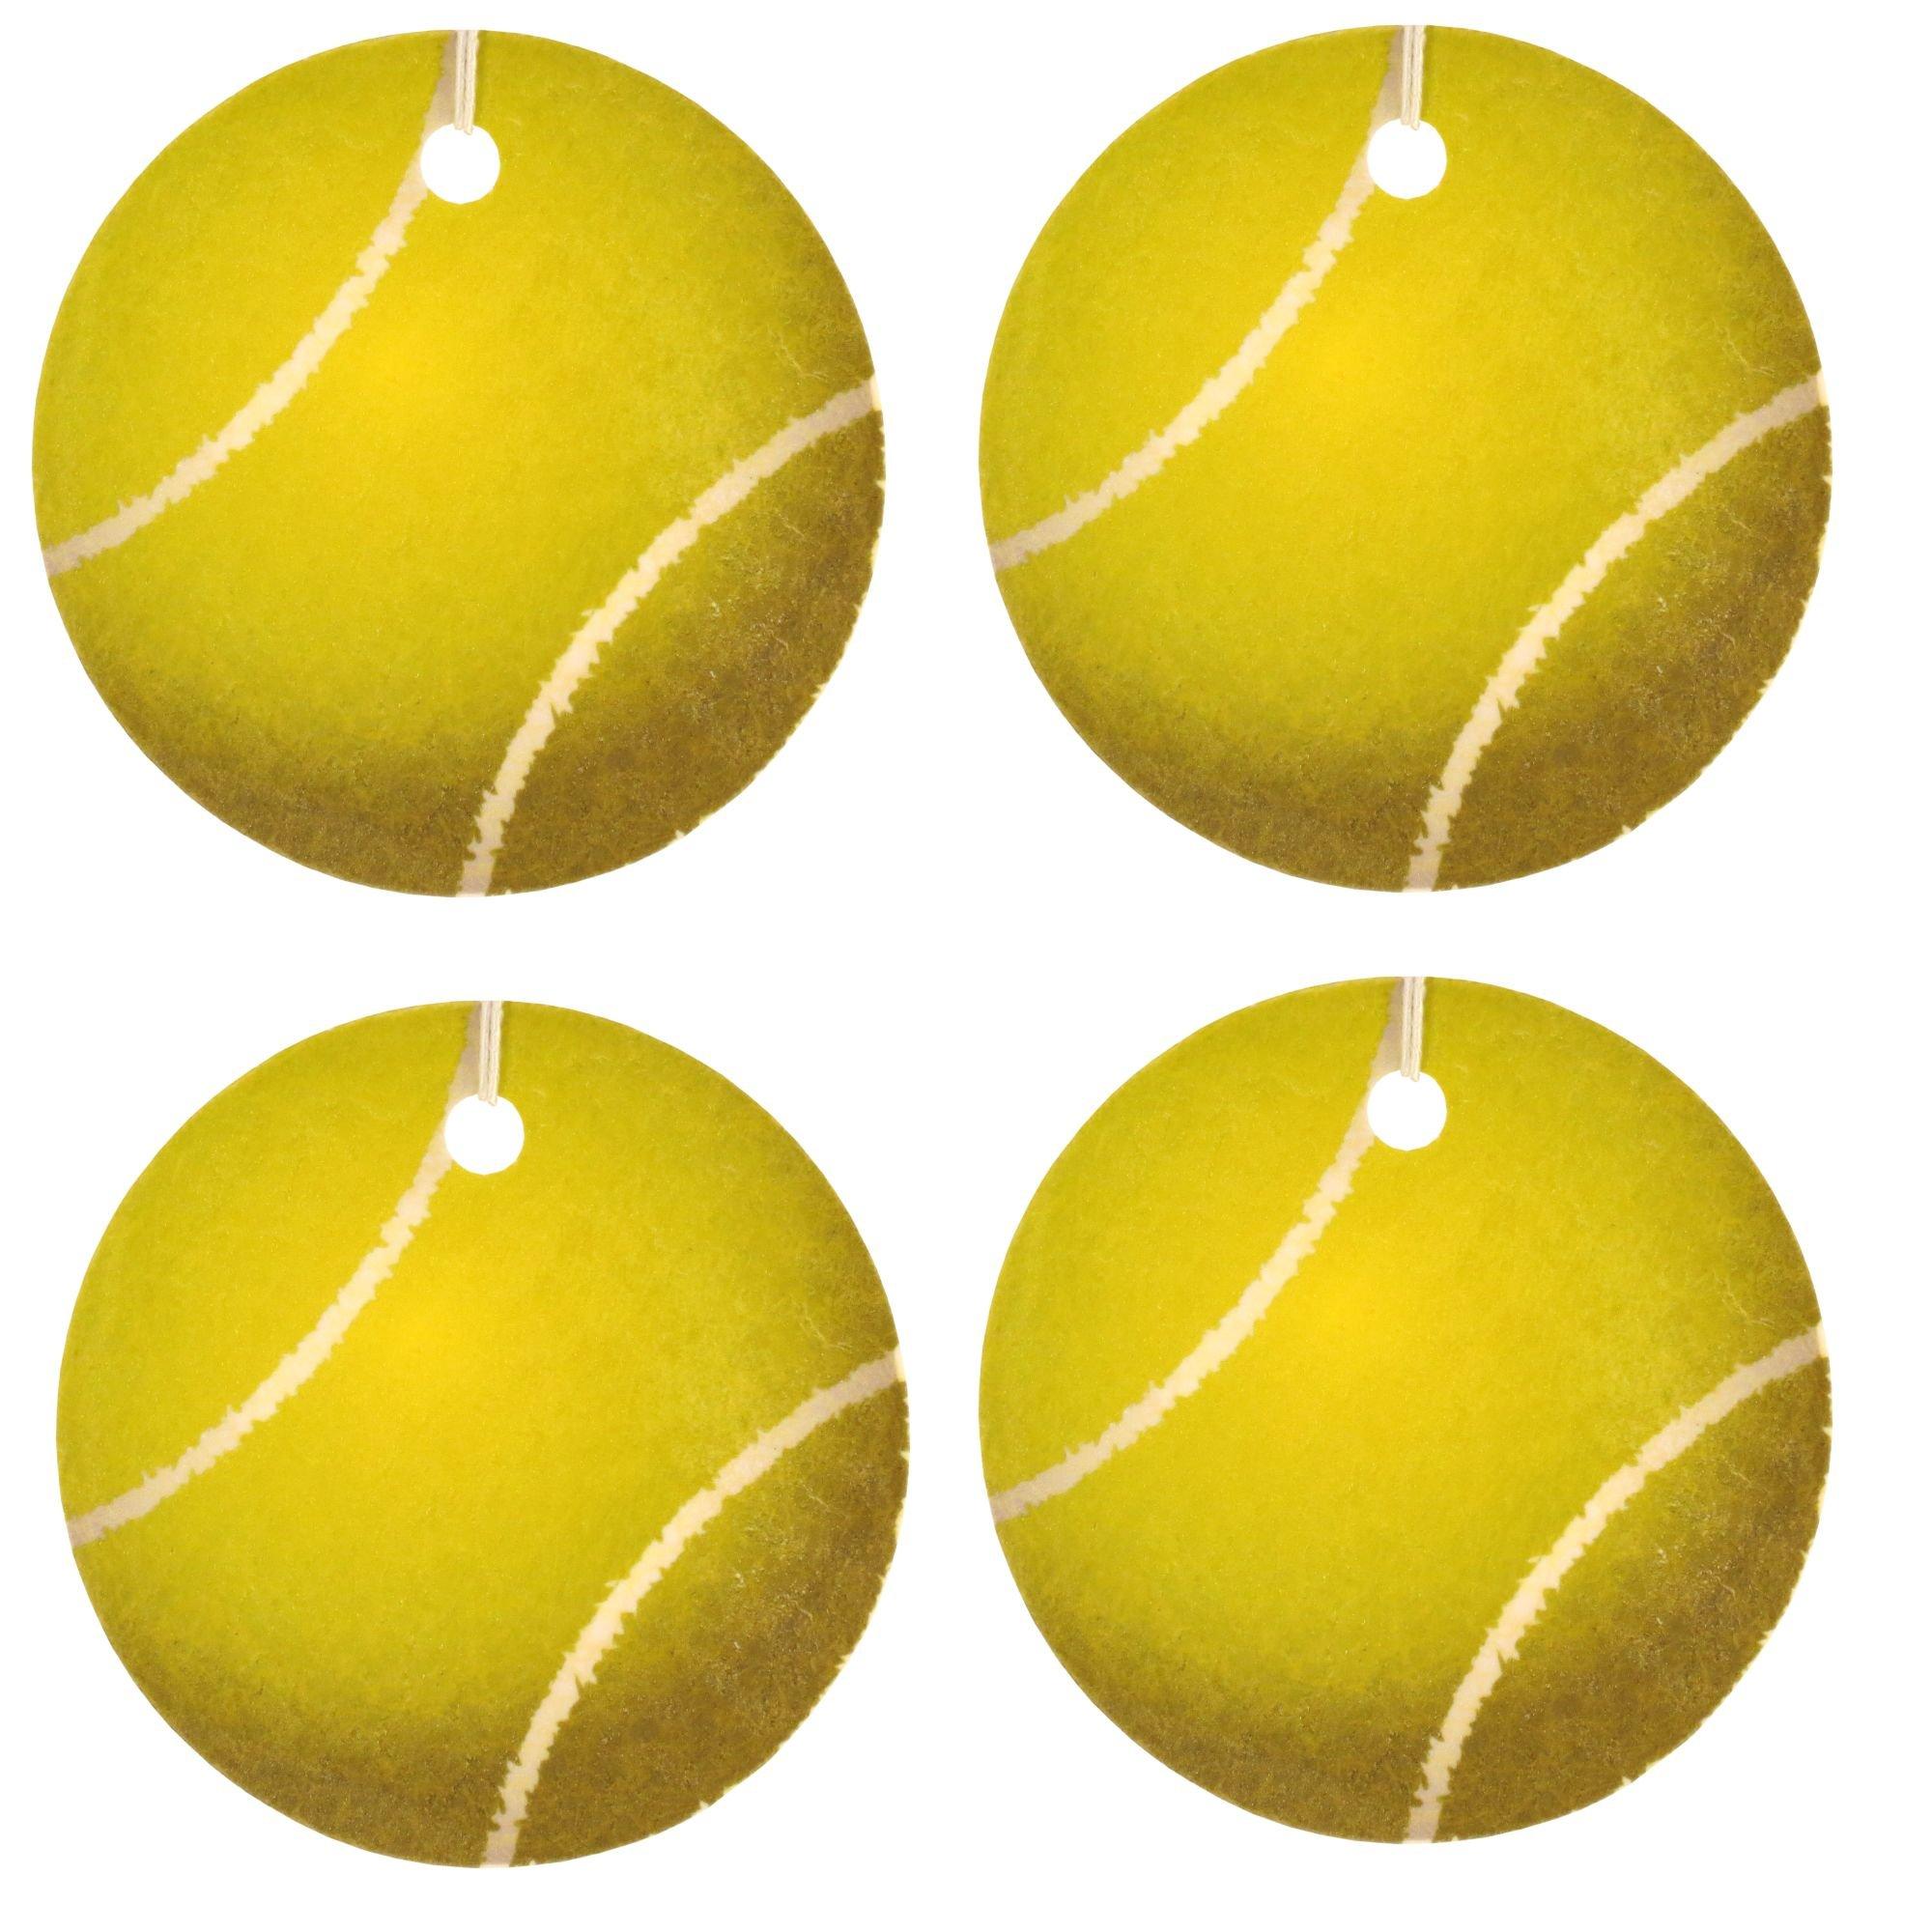 Set of Four Tennis Ball Air Fresheners, Cedarwood Essential Oil